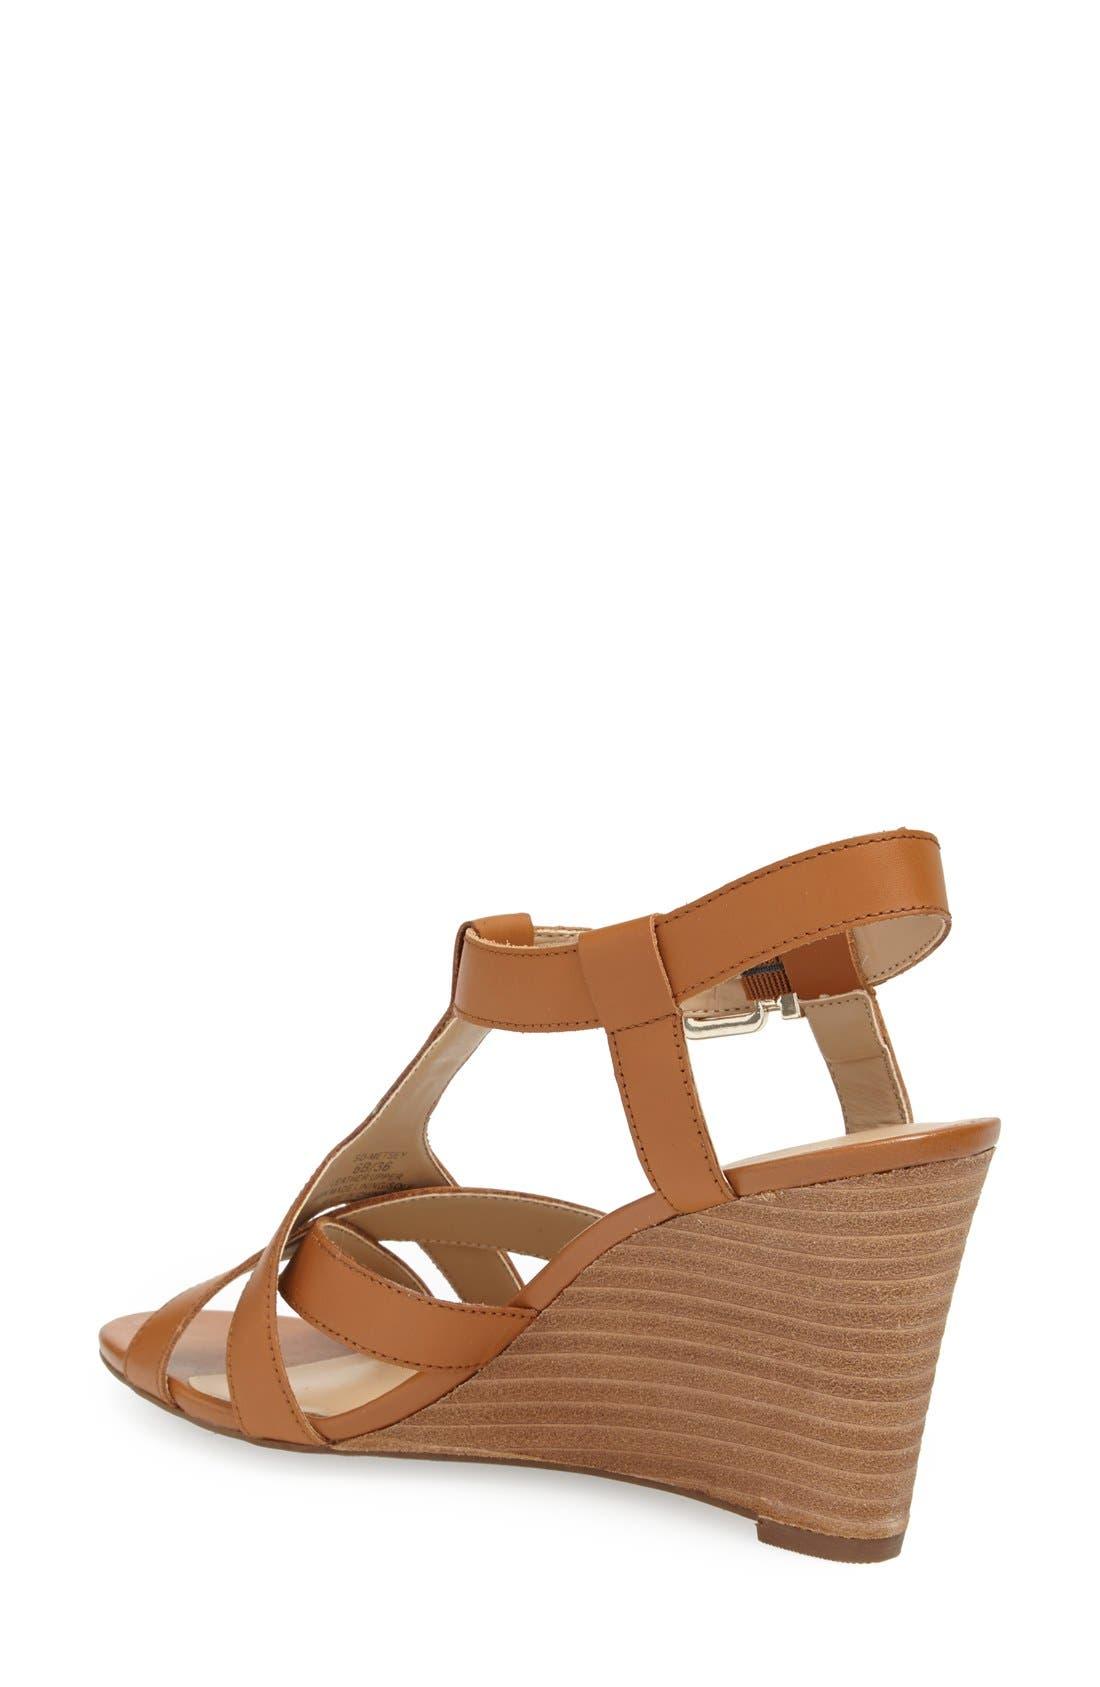 Alternate Image 2  - Sole Society 'Metsey' Wedge Sandal (Women)